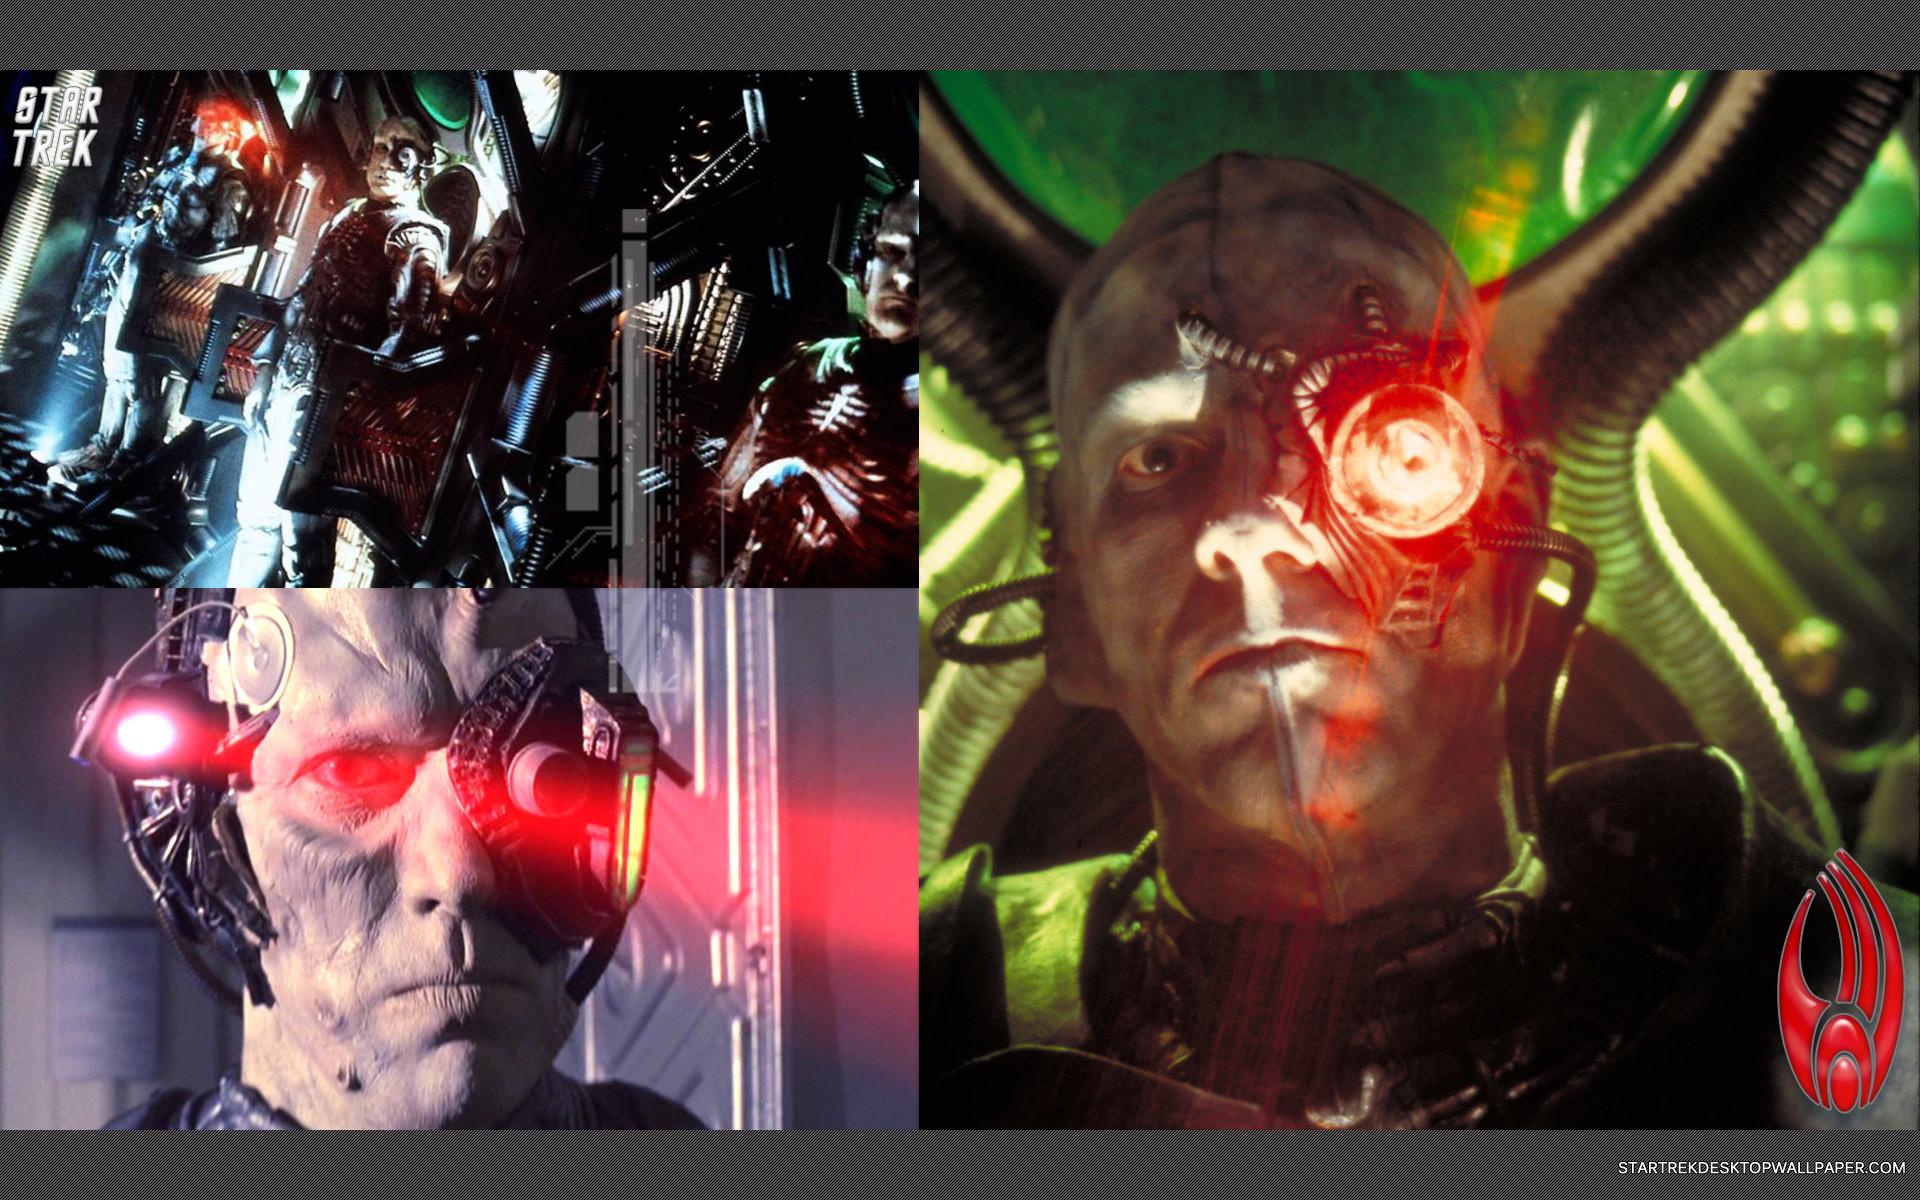 Star Trek Borg Drone. Free Star Trek computer desktop wallpaper, images,  pictures download